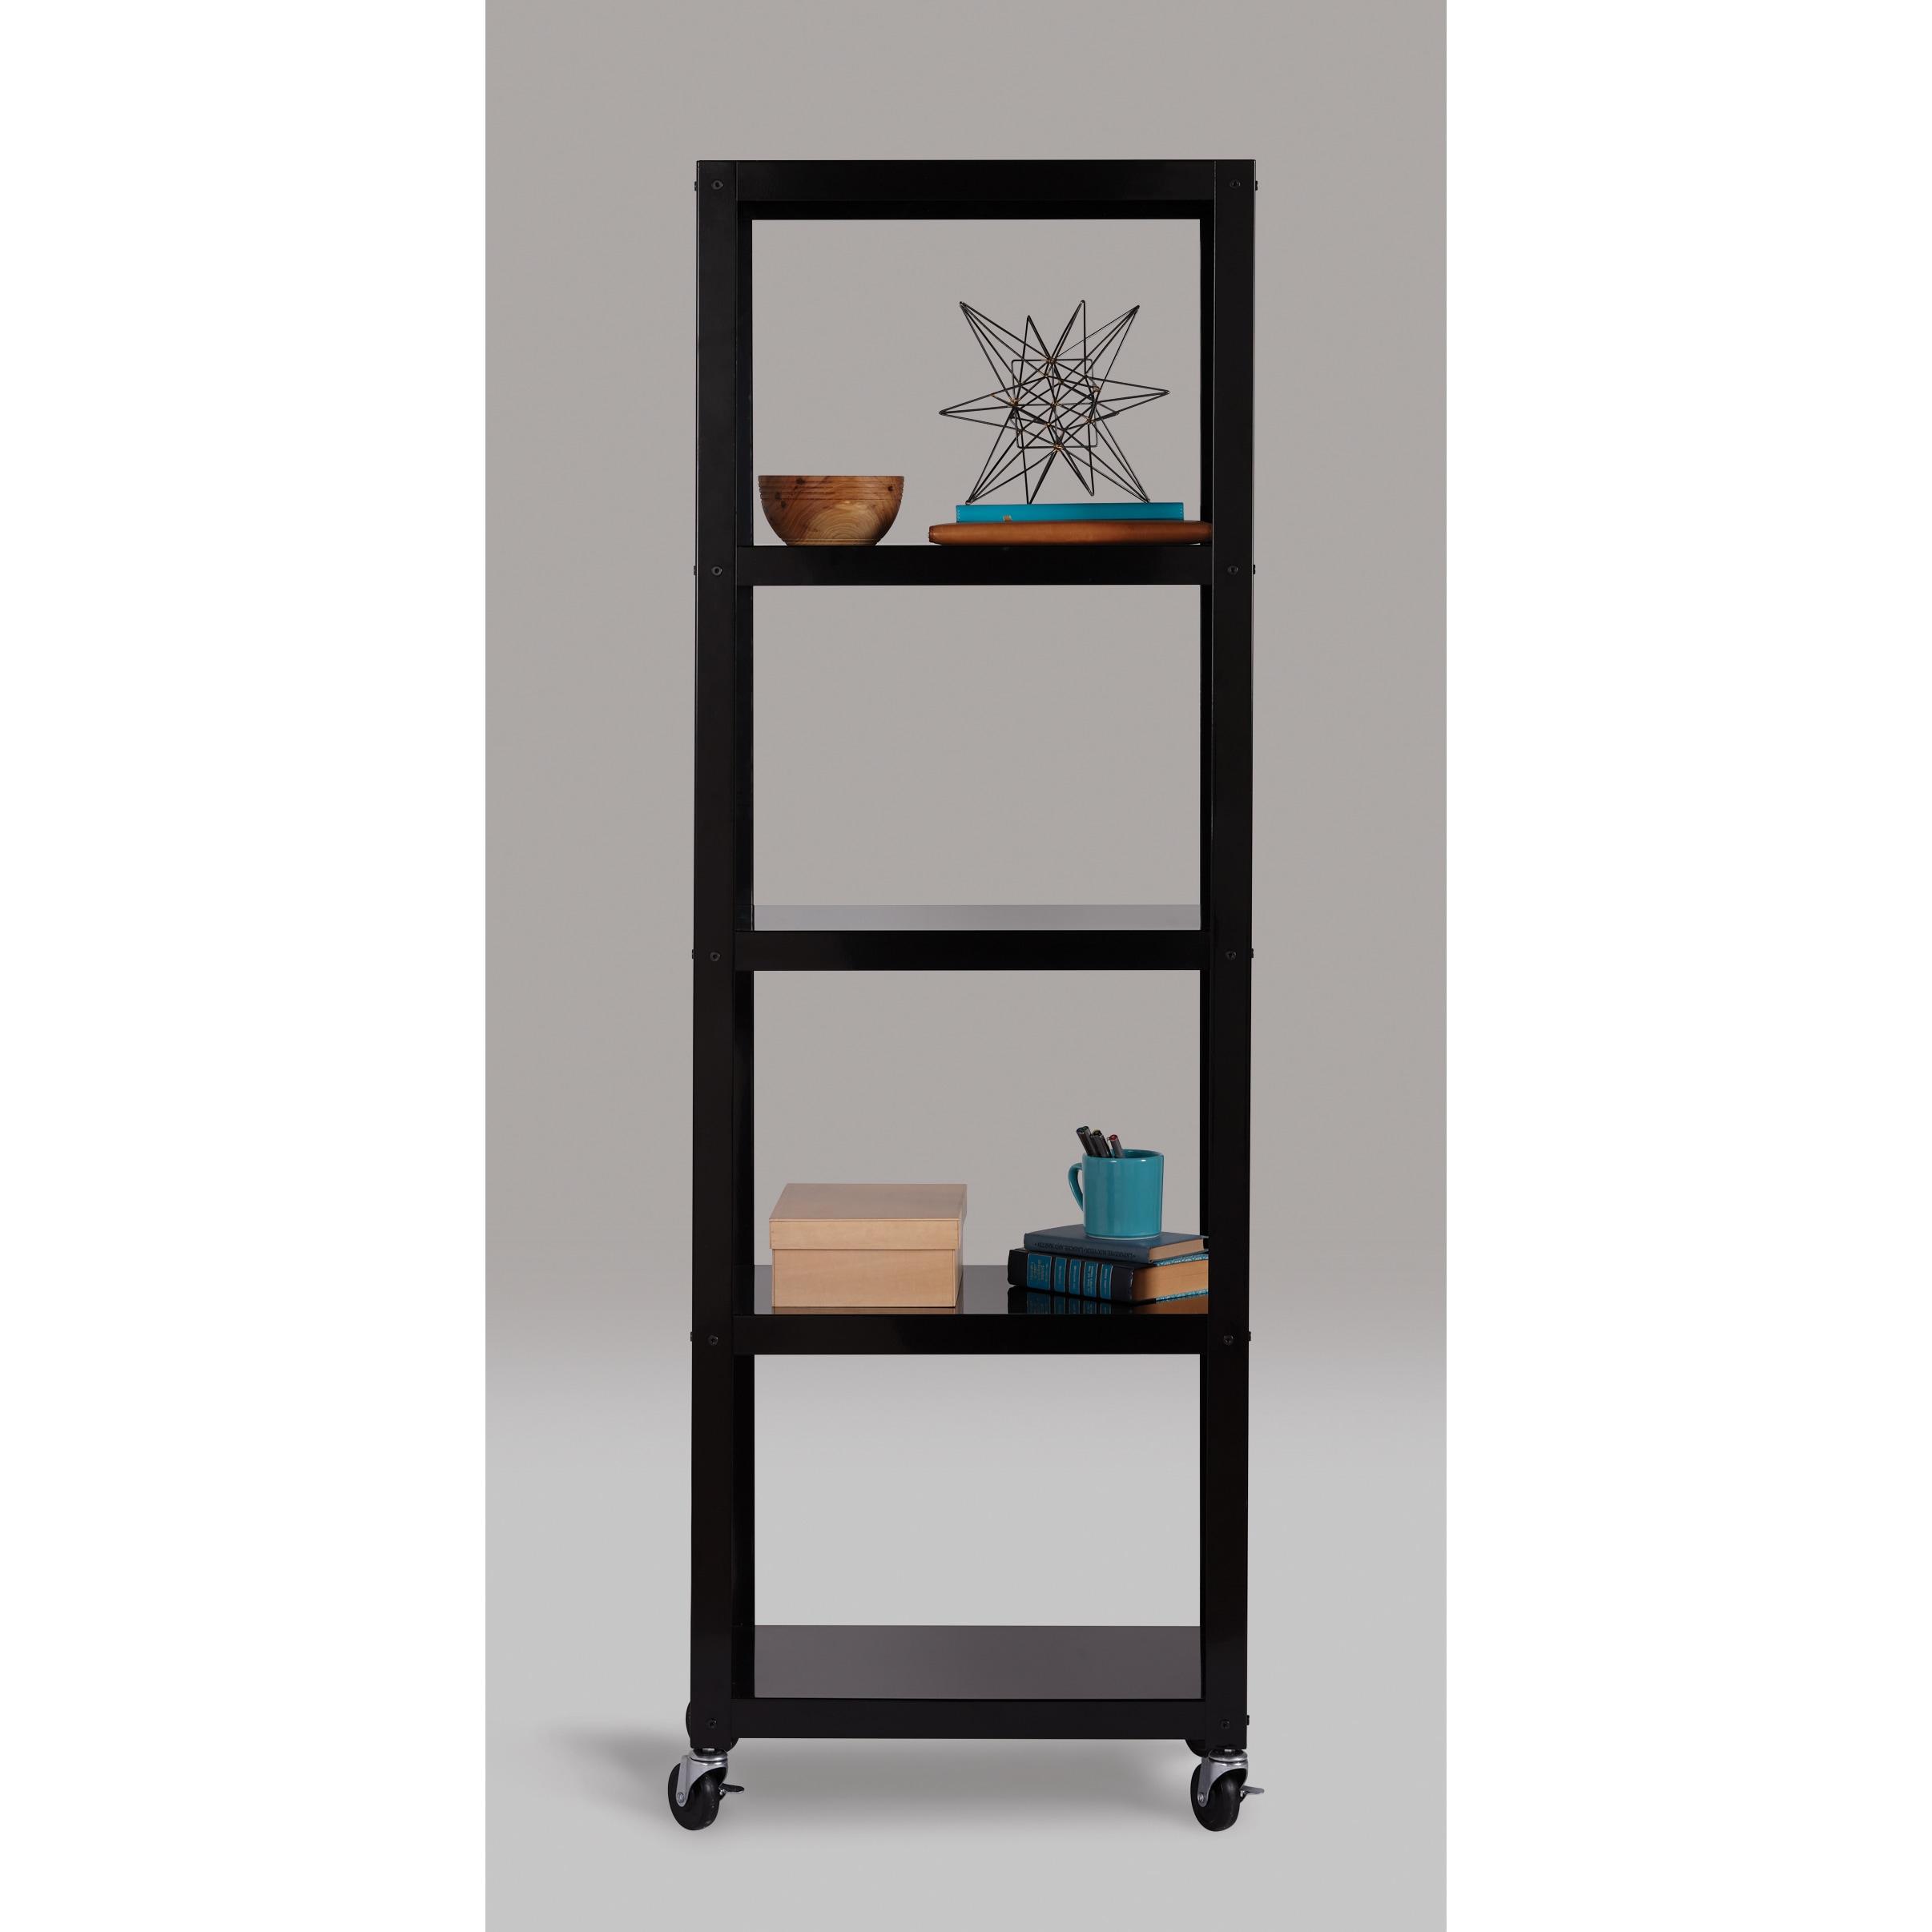 Carbon Loft Niepce Industrial Modern Mobile White 5 Shelf Bookcase Cart